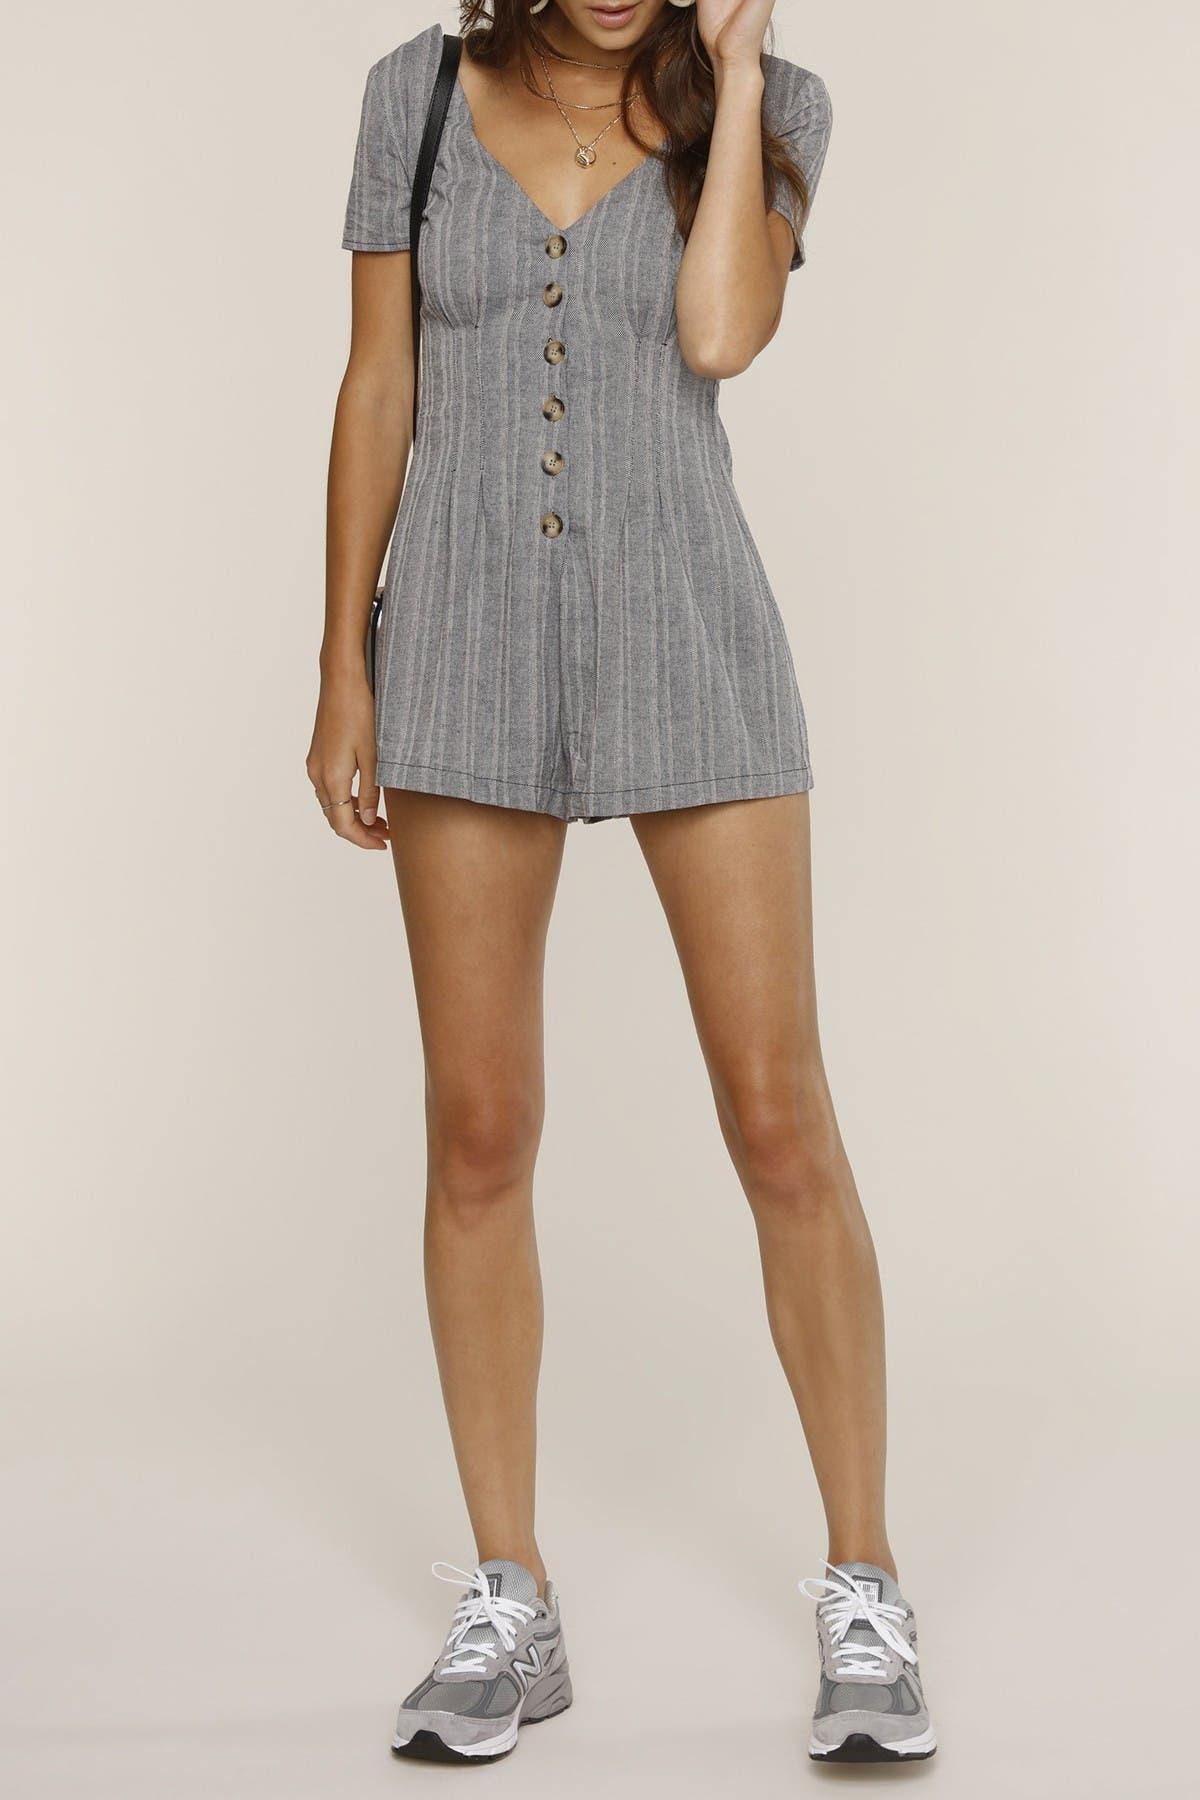 Image of Heartloom Kate Striped Short Sleeve Romper